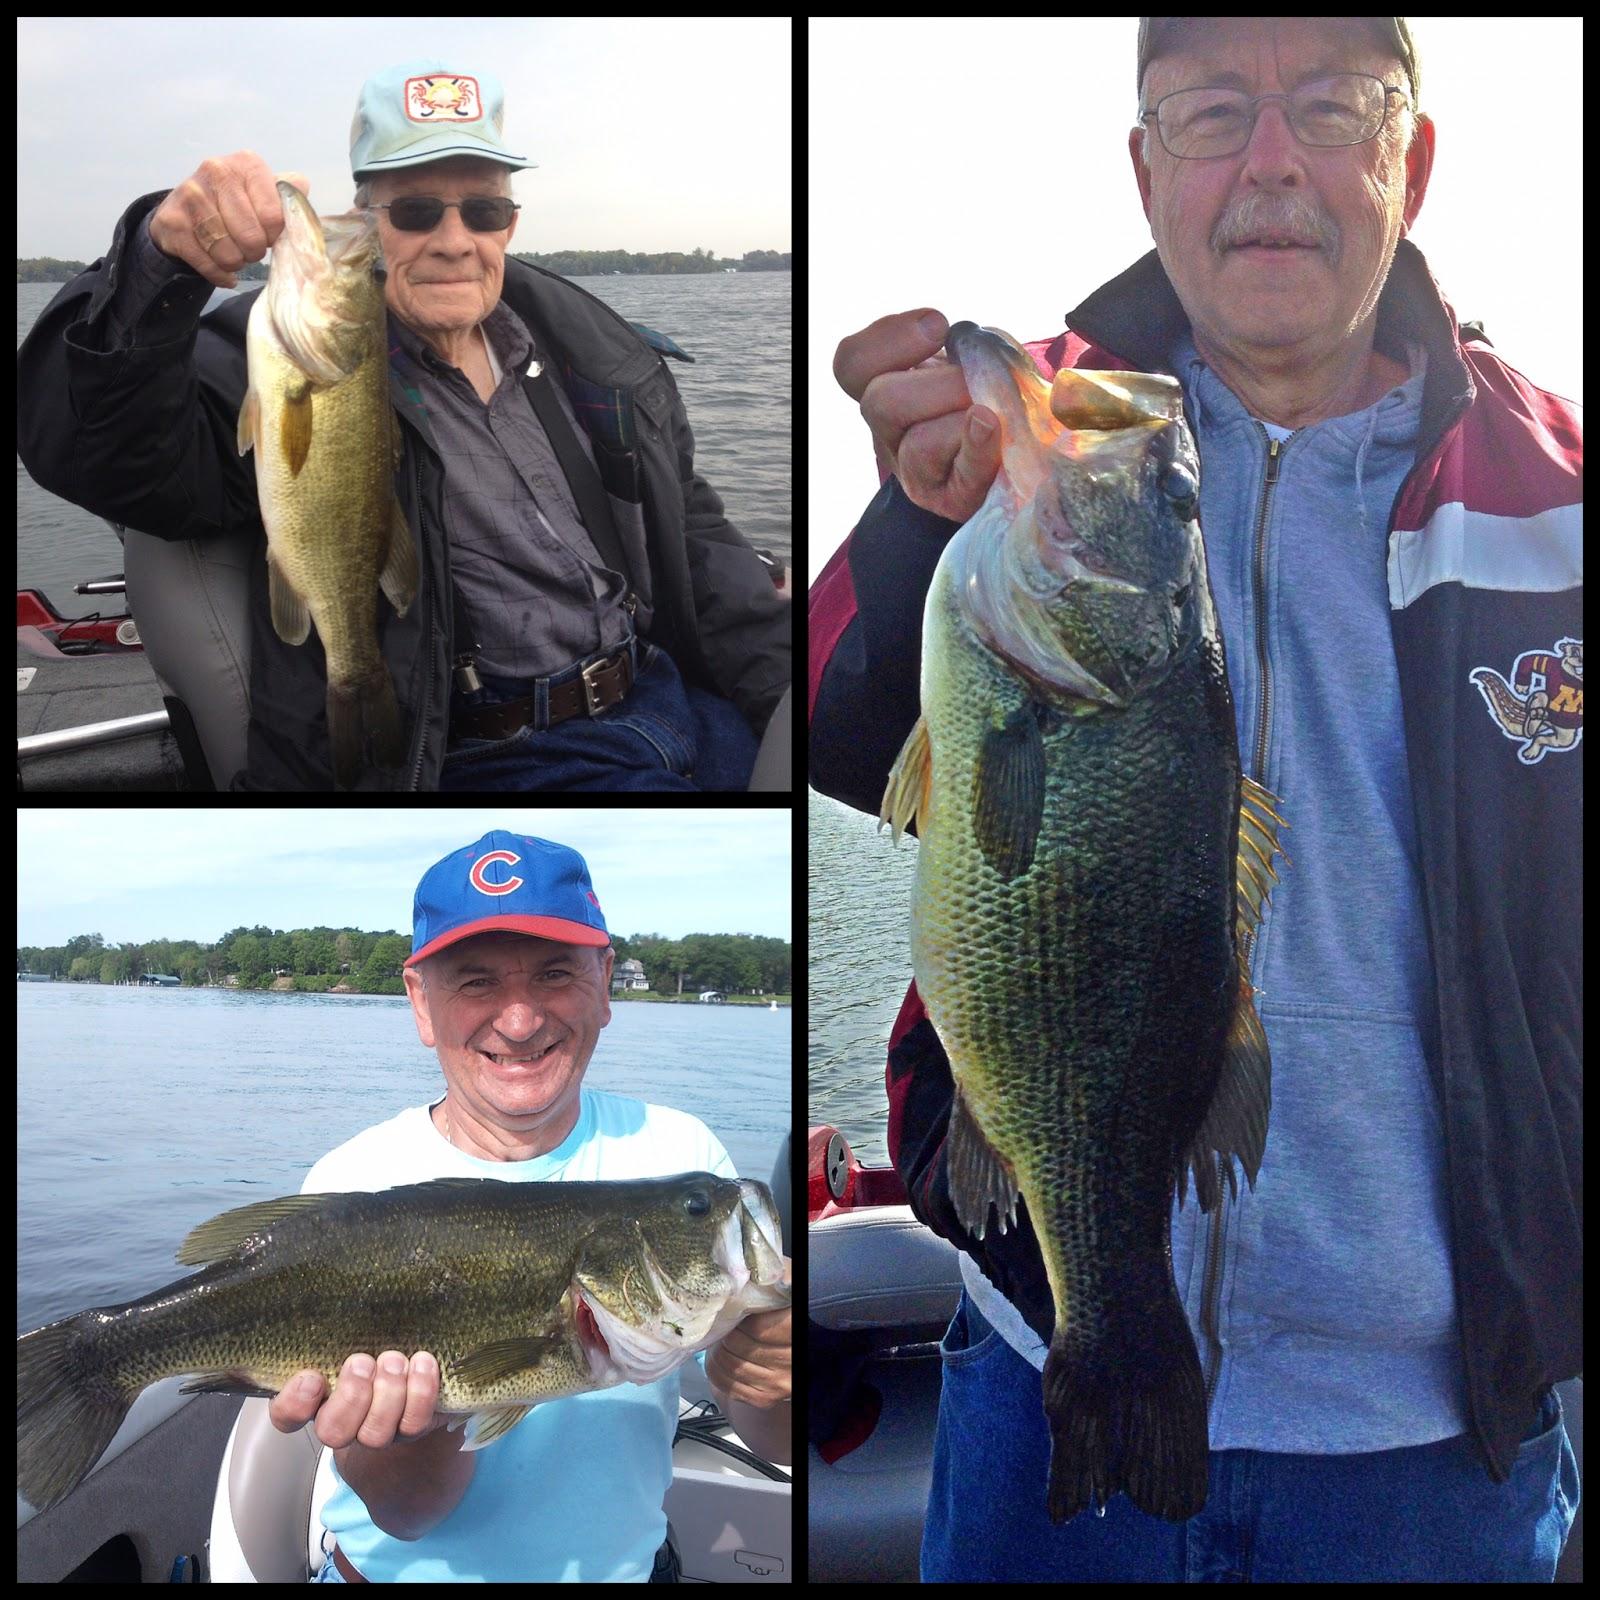 Take the bait guide service llc on lake minnetonka for Lake minnetonka fishing report